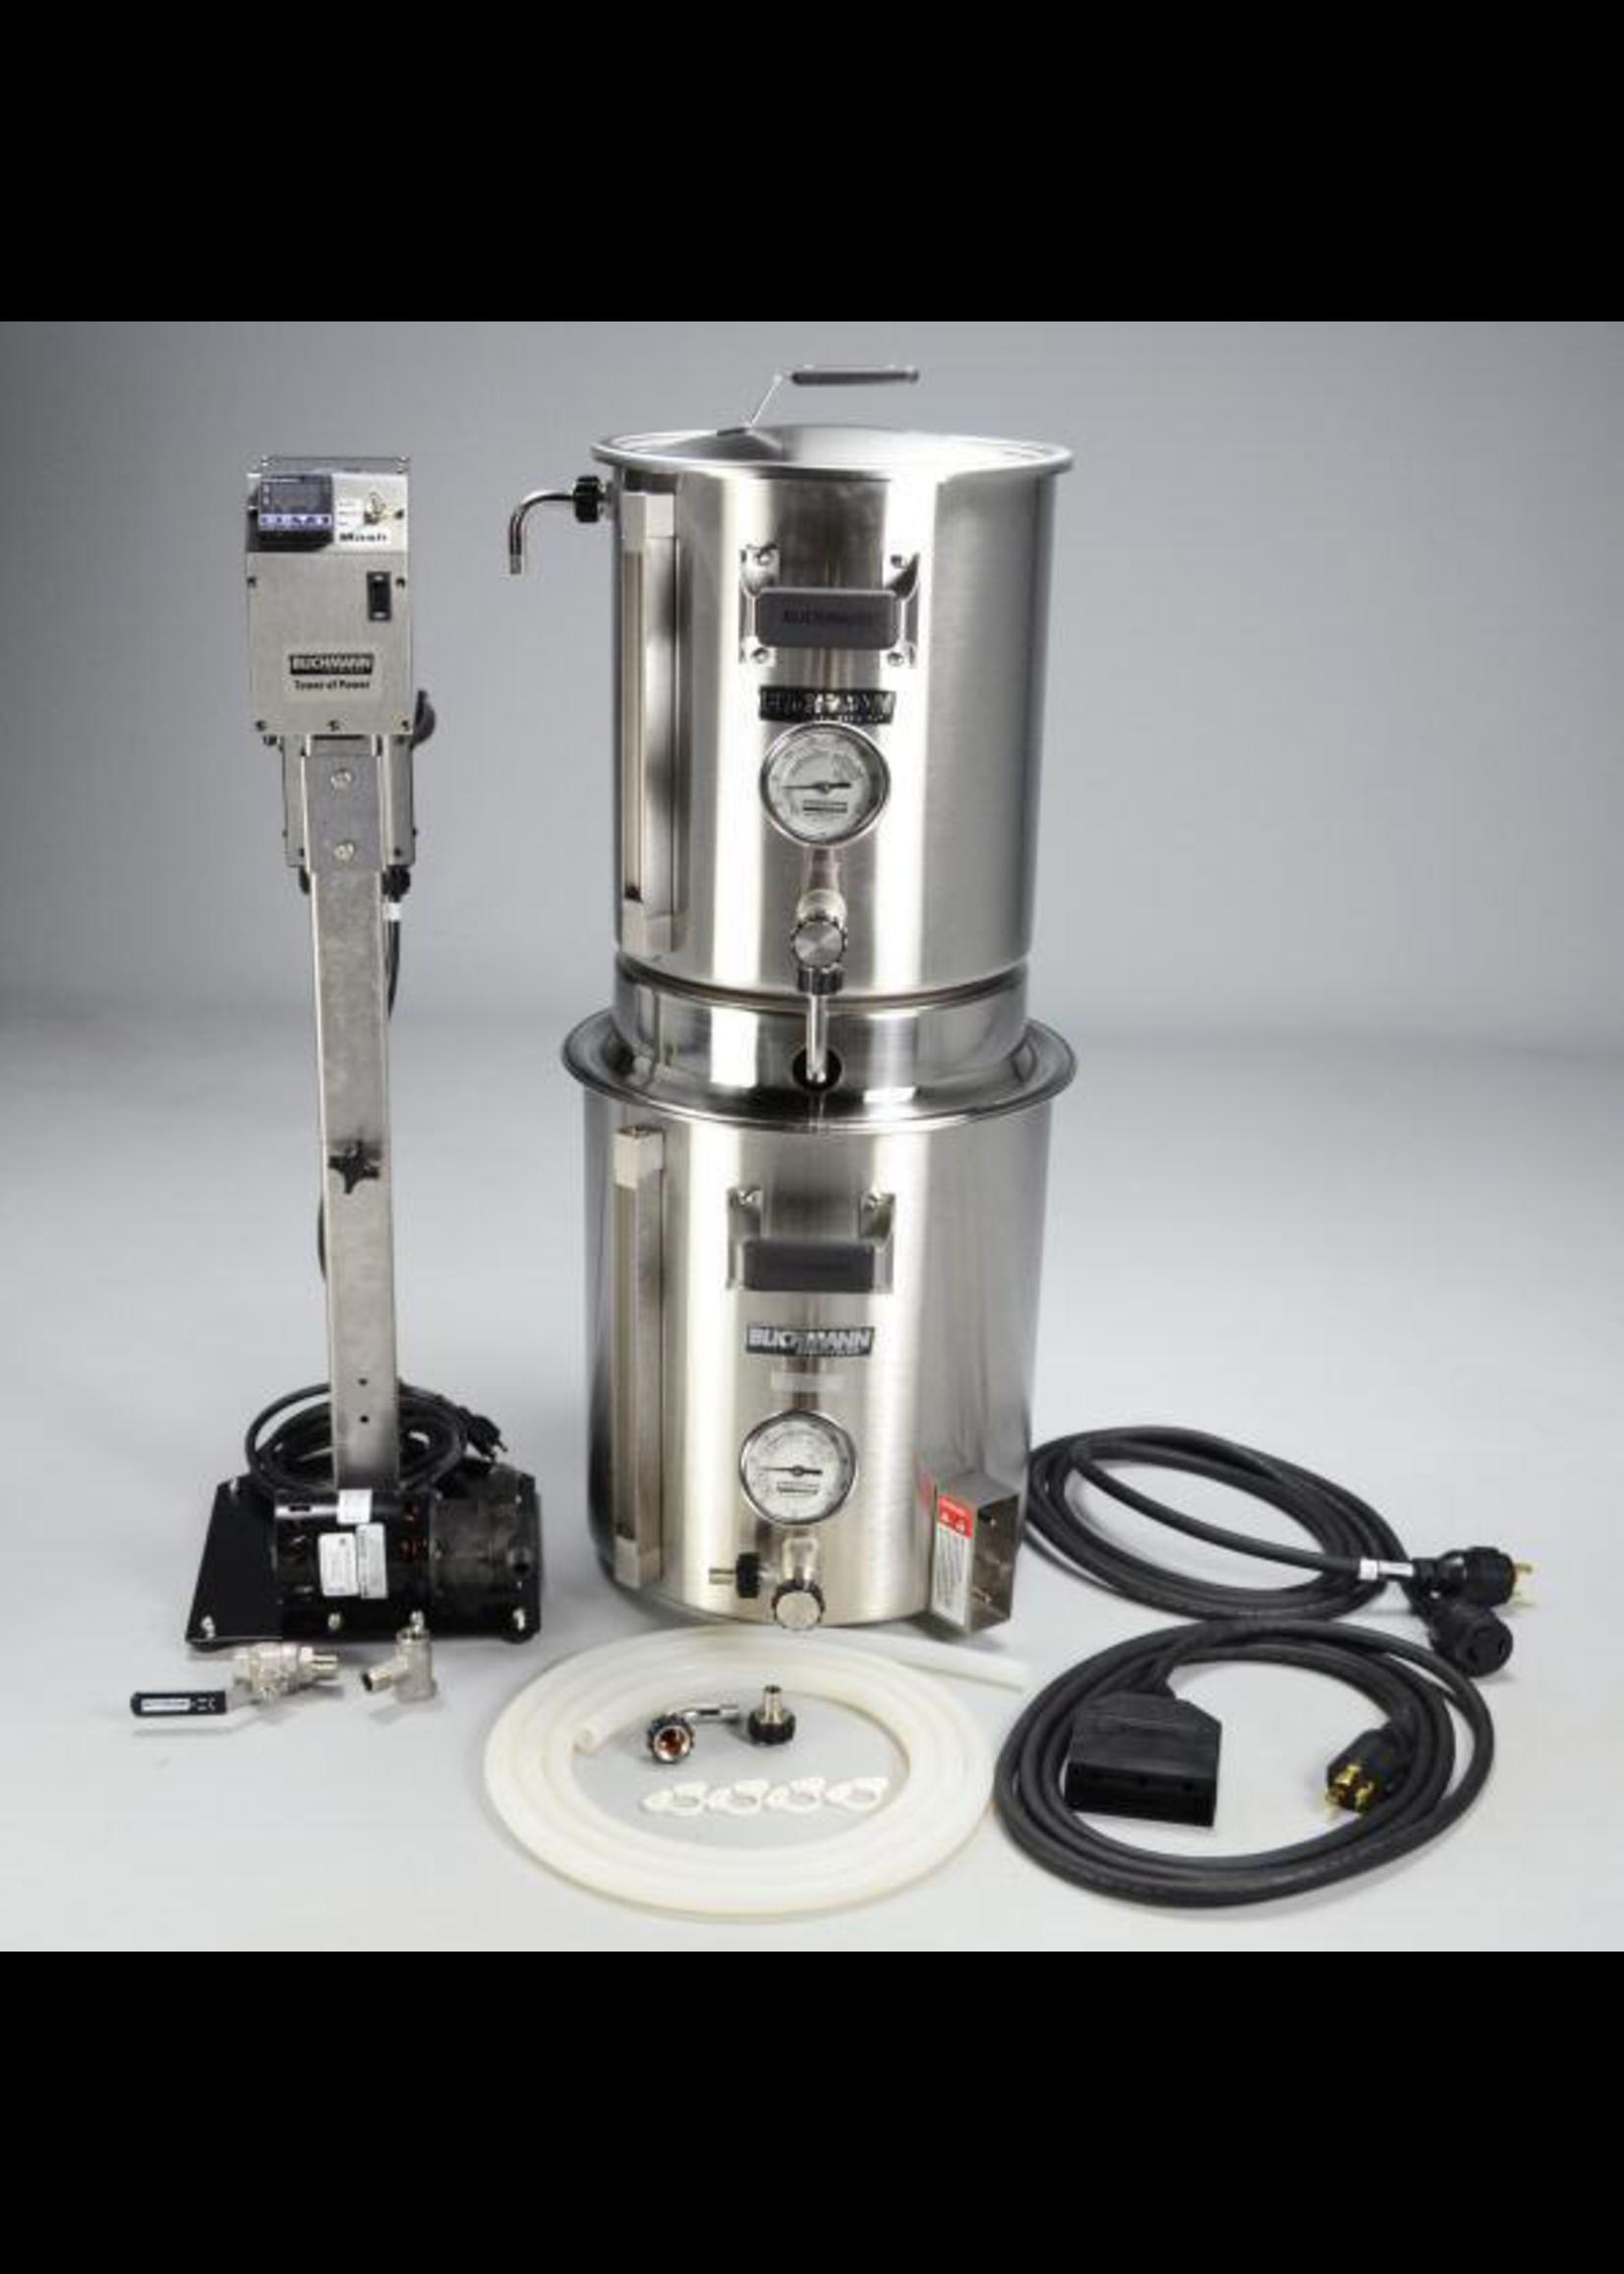 Blichmann Blichmann BrewEasy - Turnkey Kit - 240V FULL VERSION - 5 Gallon G2